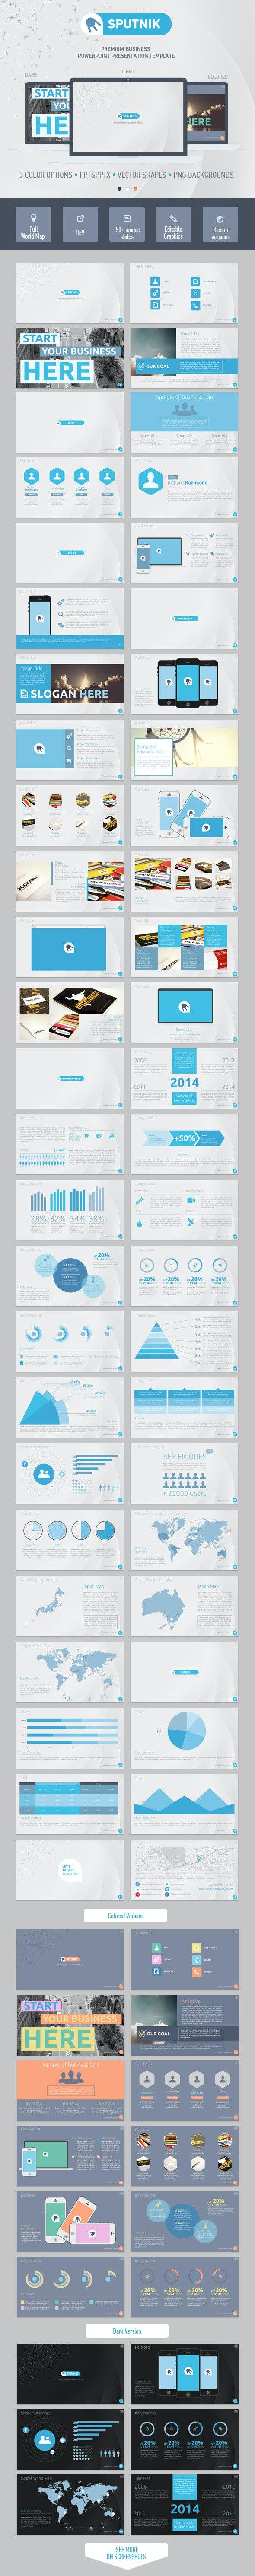 Sputnik PowerPoint Presentation Template - PowerPoint Templates Presentation Templates